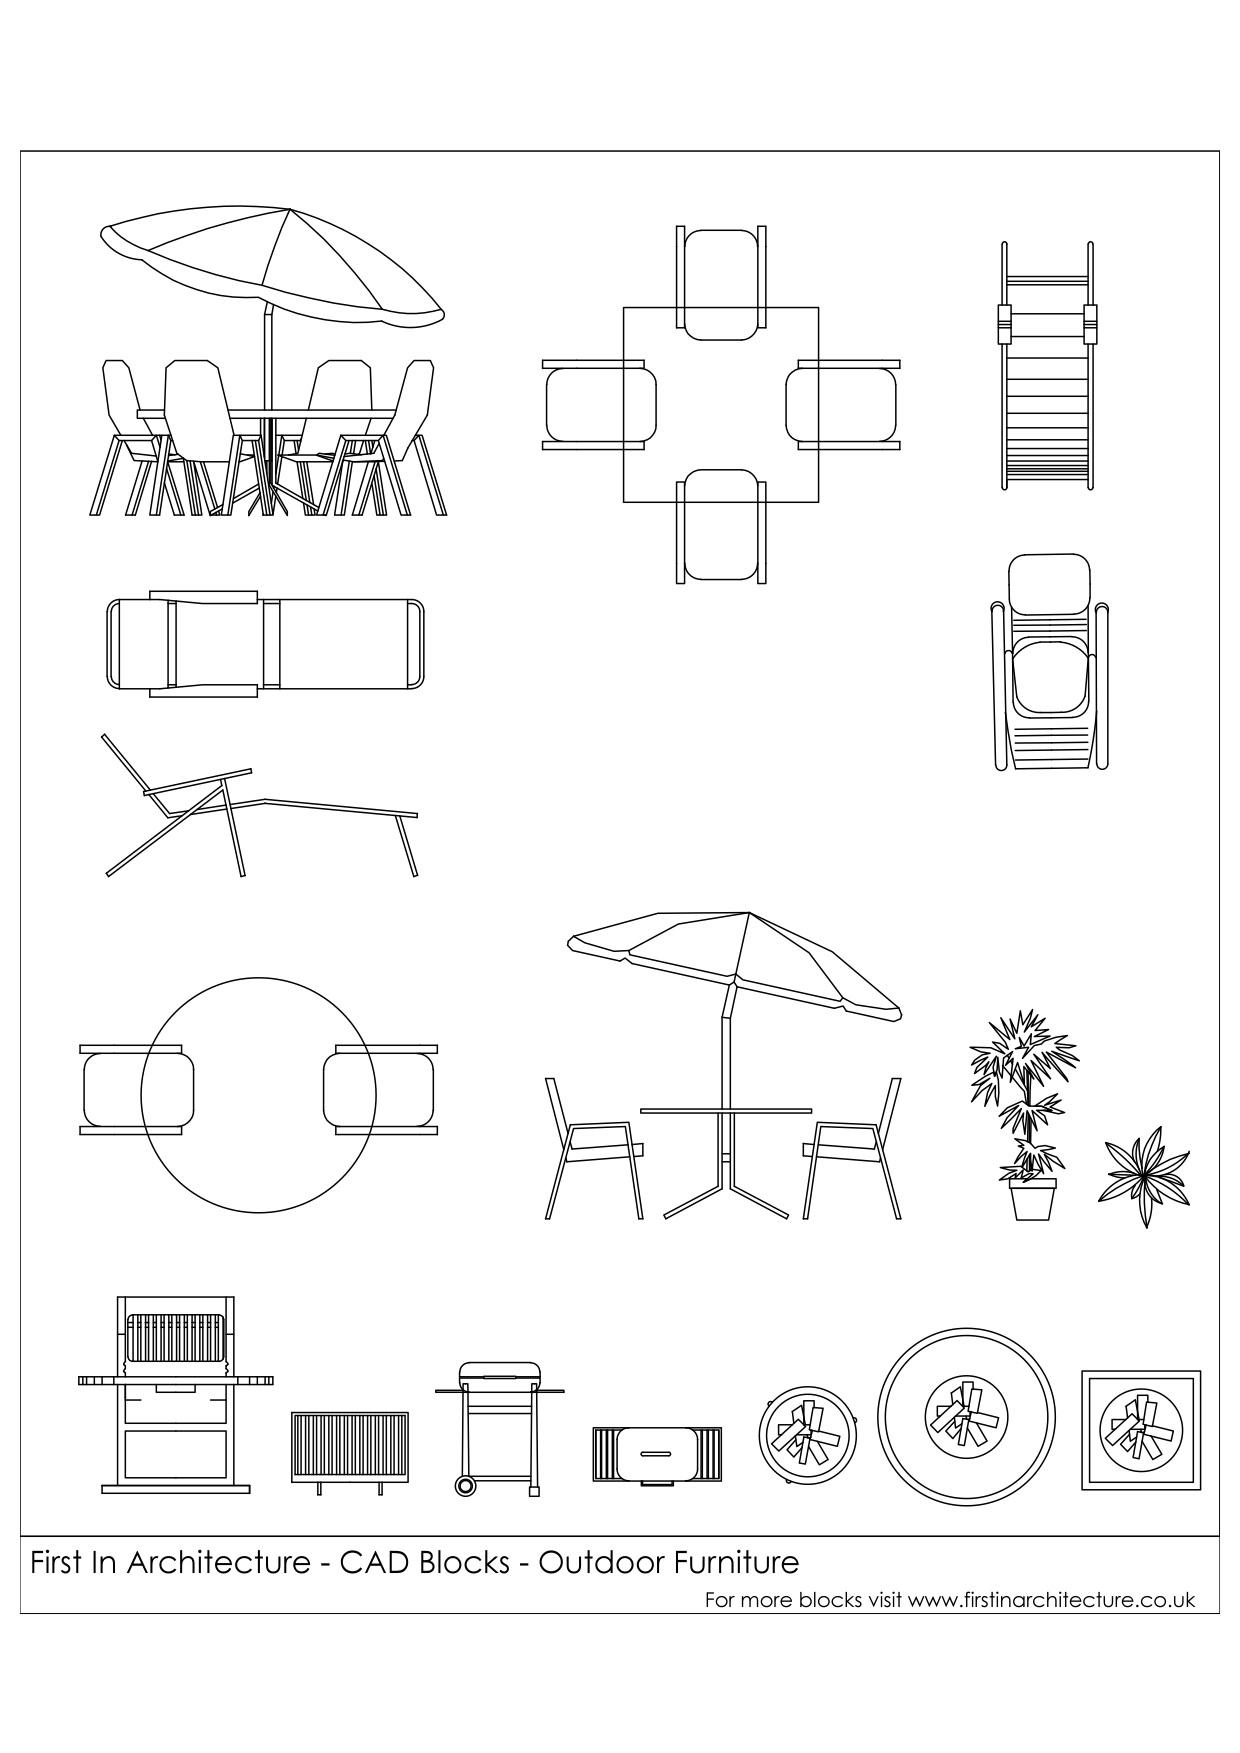 Enjoyable Free Cad Blocks Outdoor Furniture Andrewgaddart Wooden Chair Designs For Living Room Andrewgaddartcom